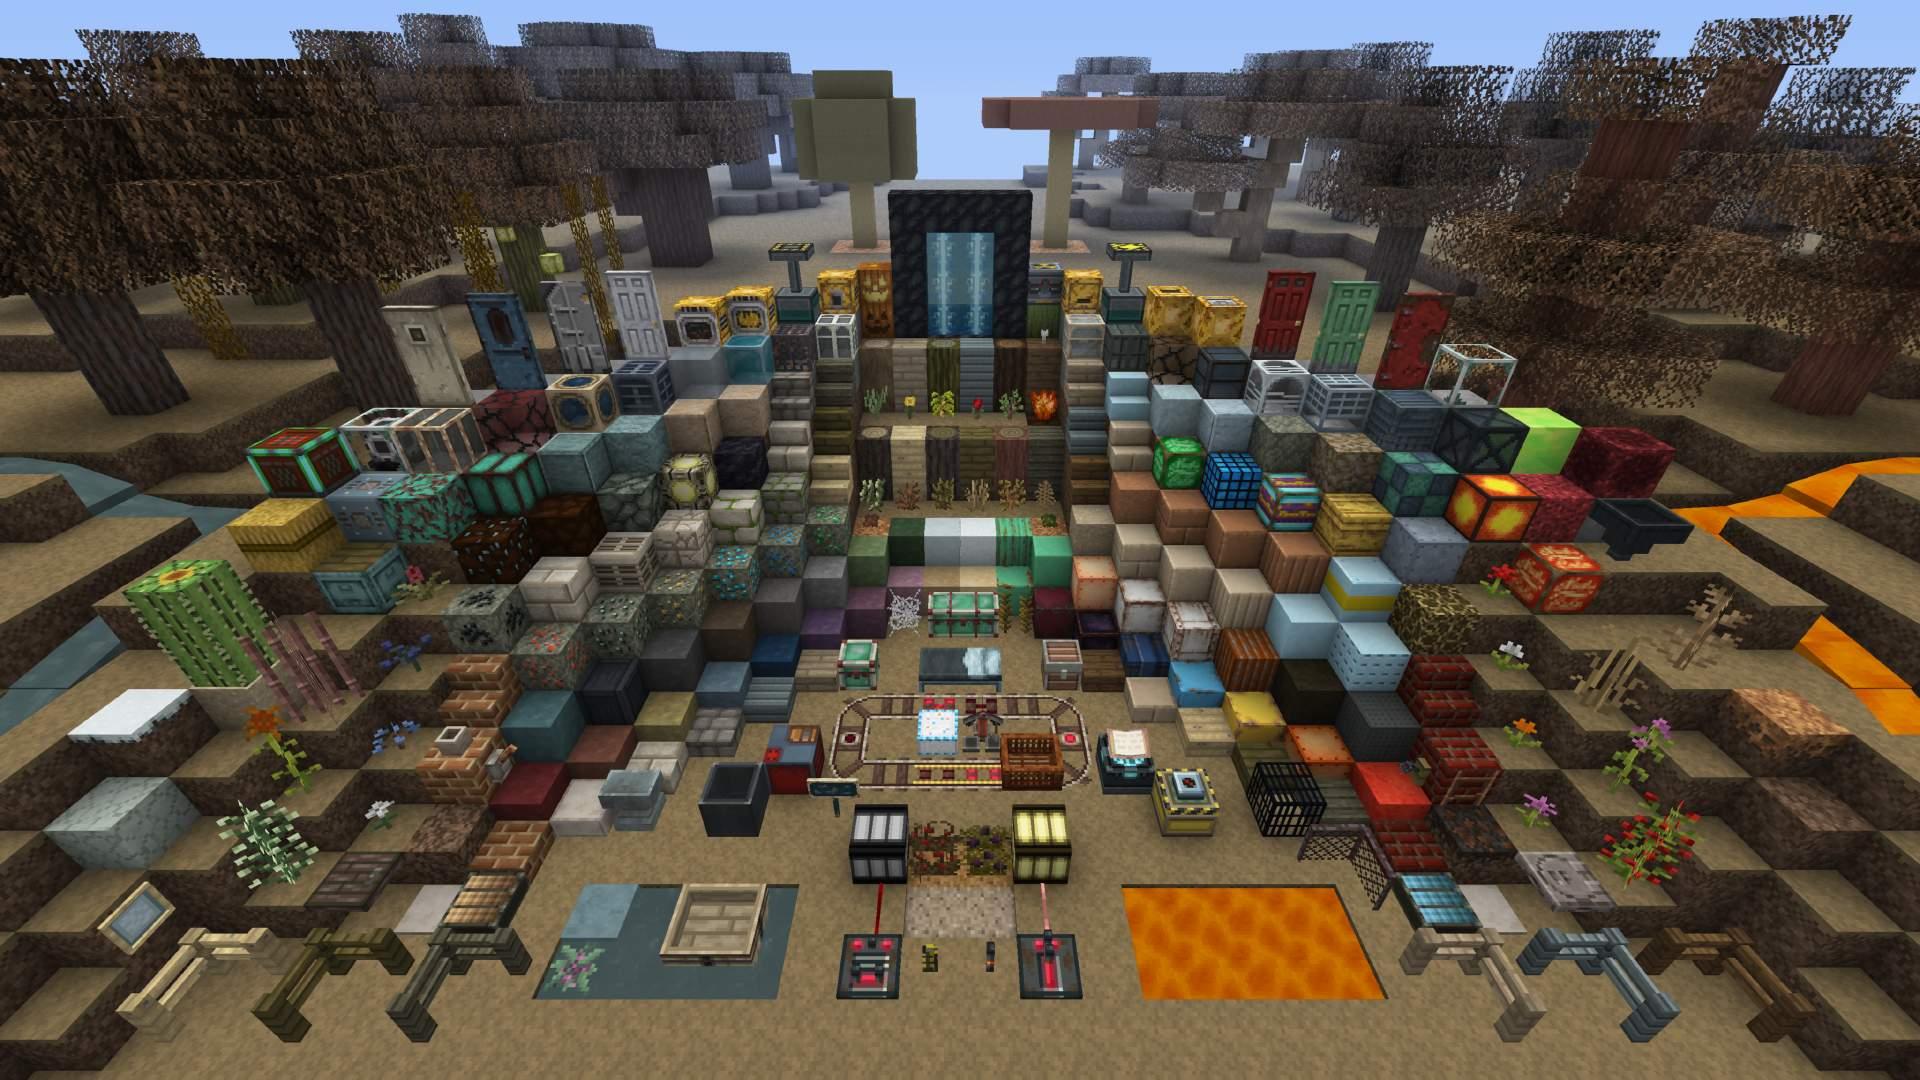 Minecraft Fallout Mash Up